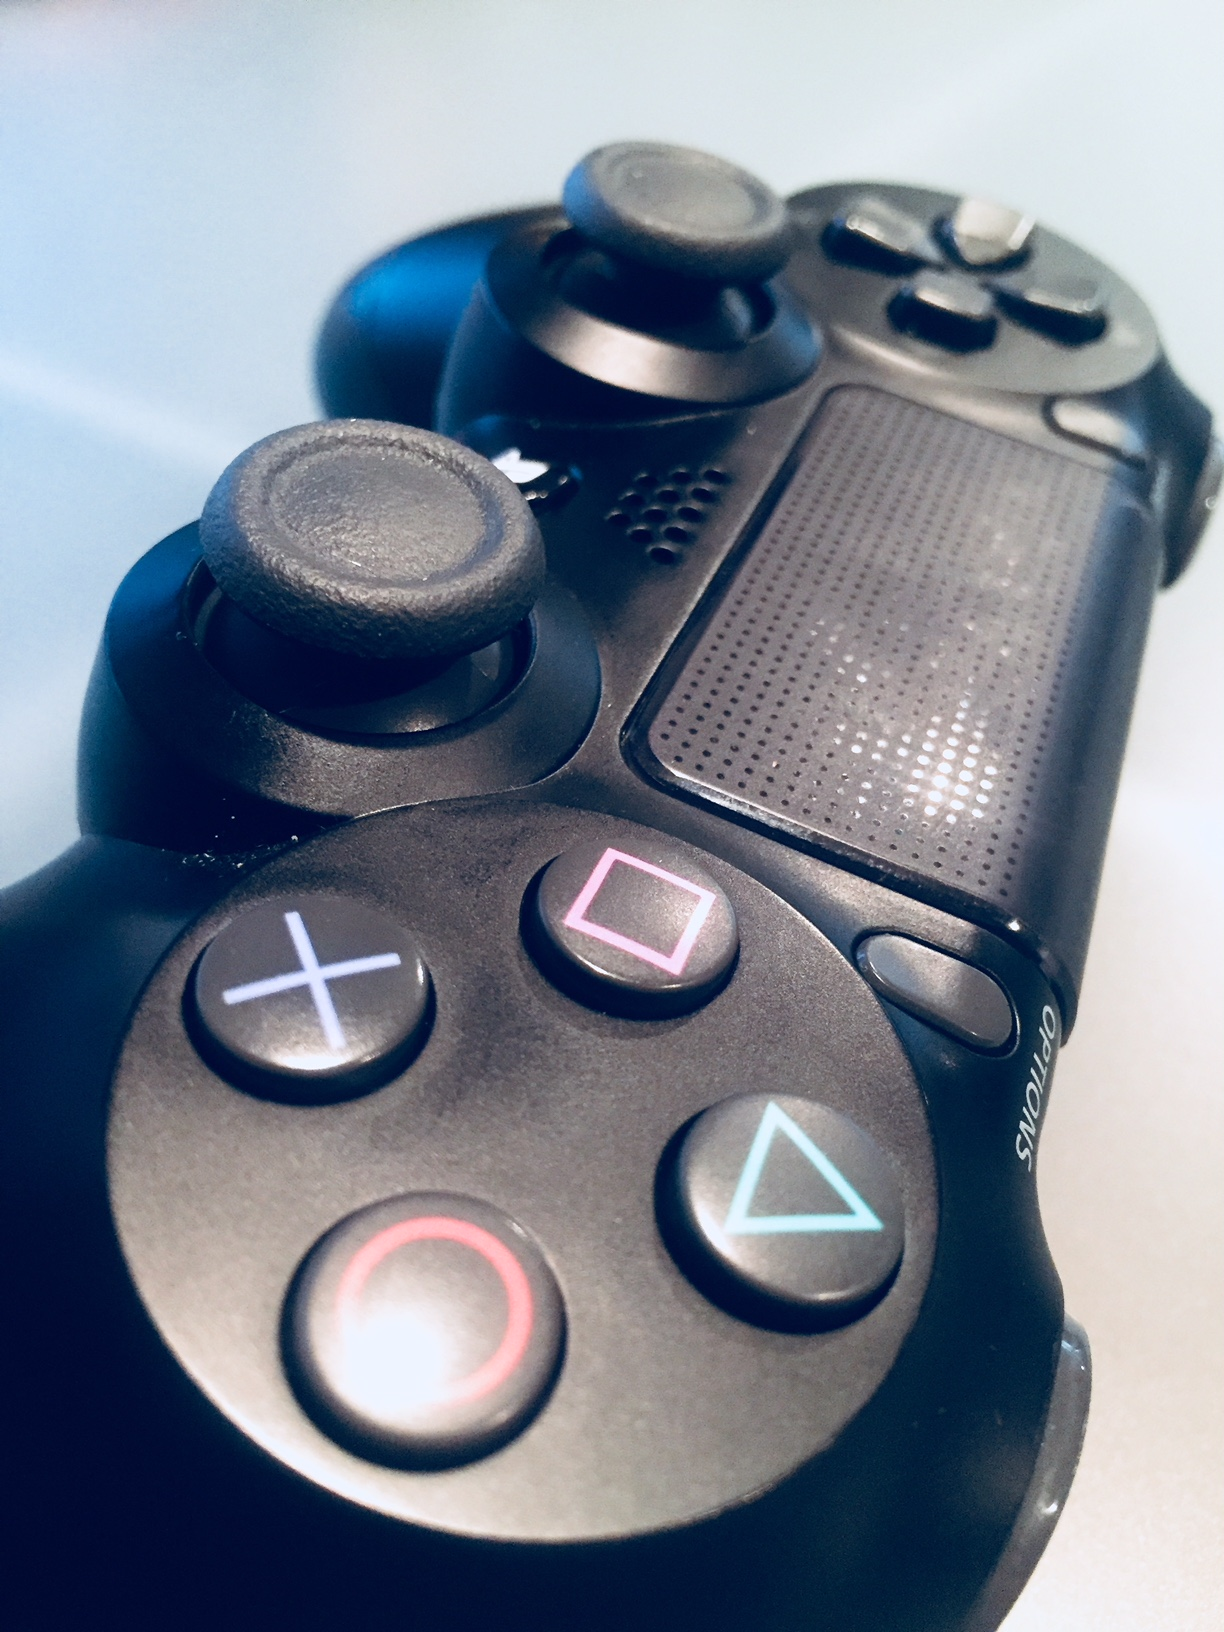 PS Controller.jpg